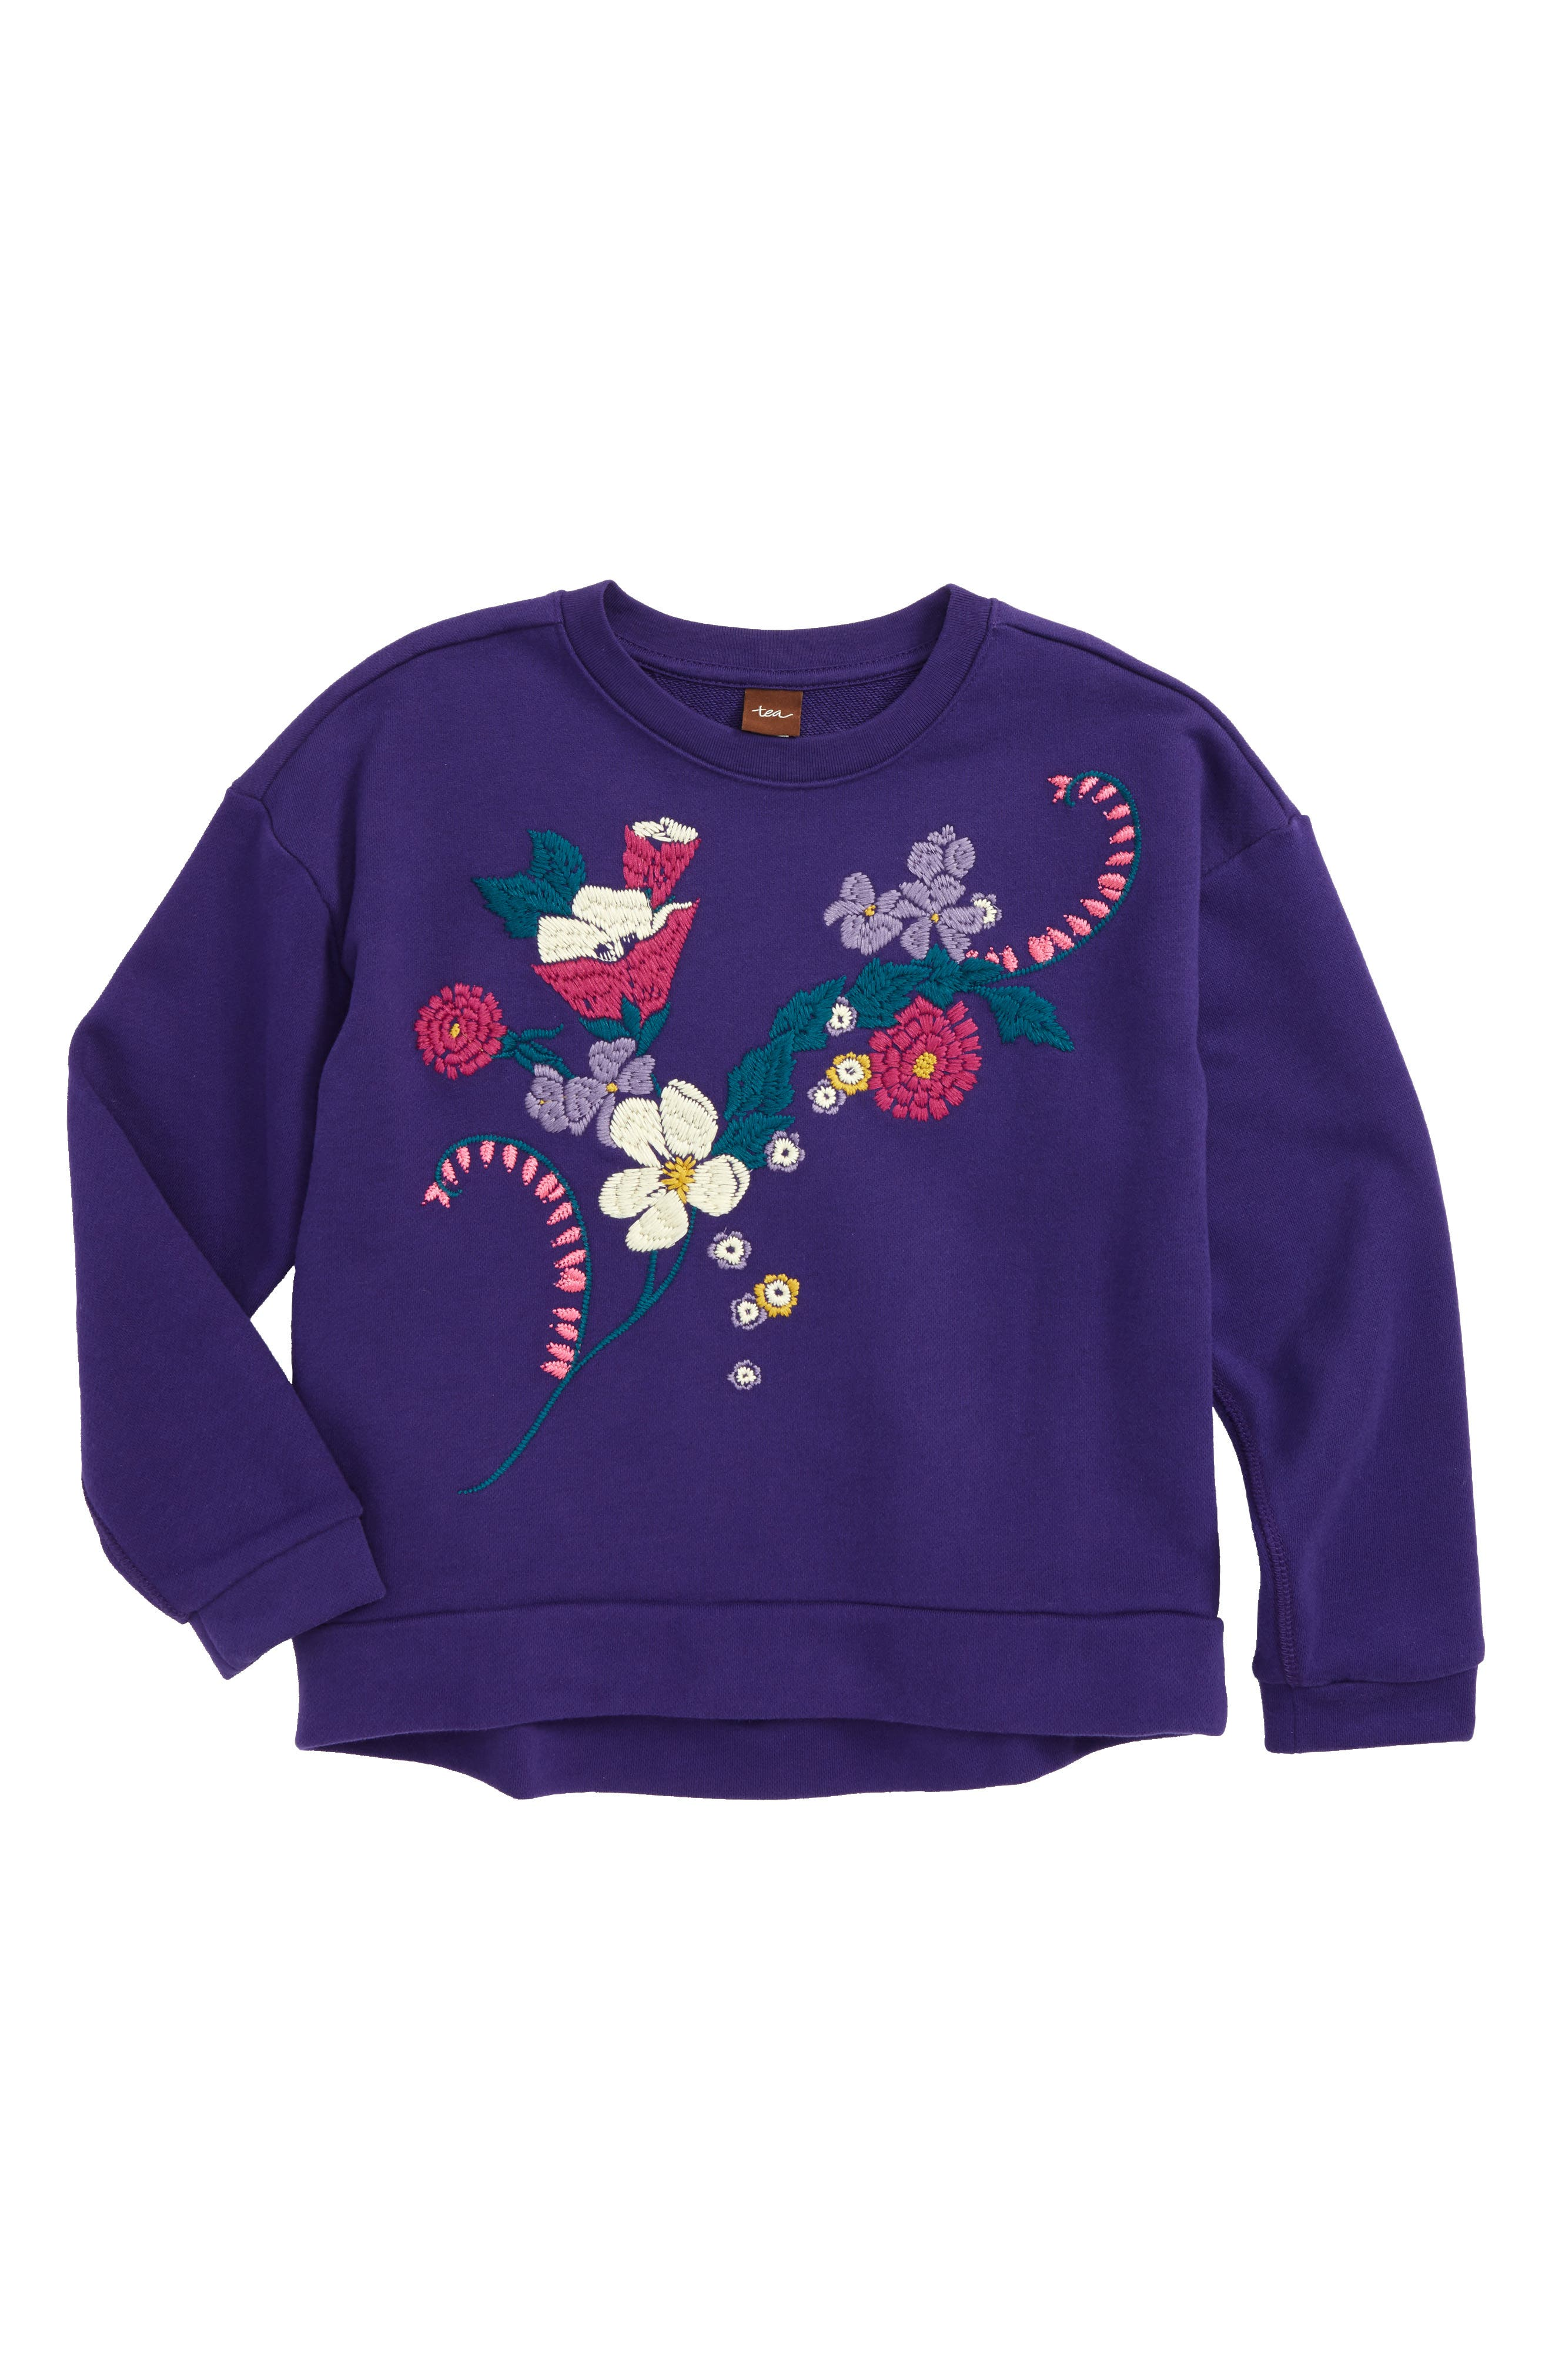 Primrose Embroidered Sweatshirt,                             Main thumbnail 1, color,                             542